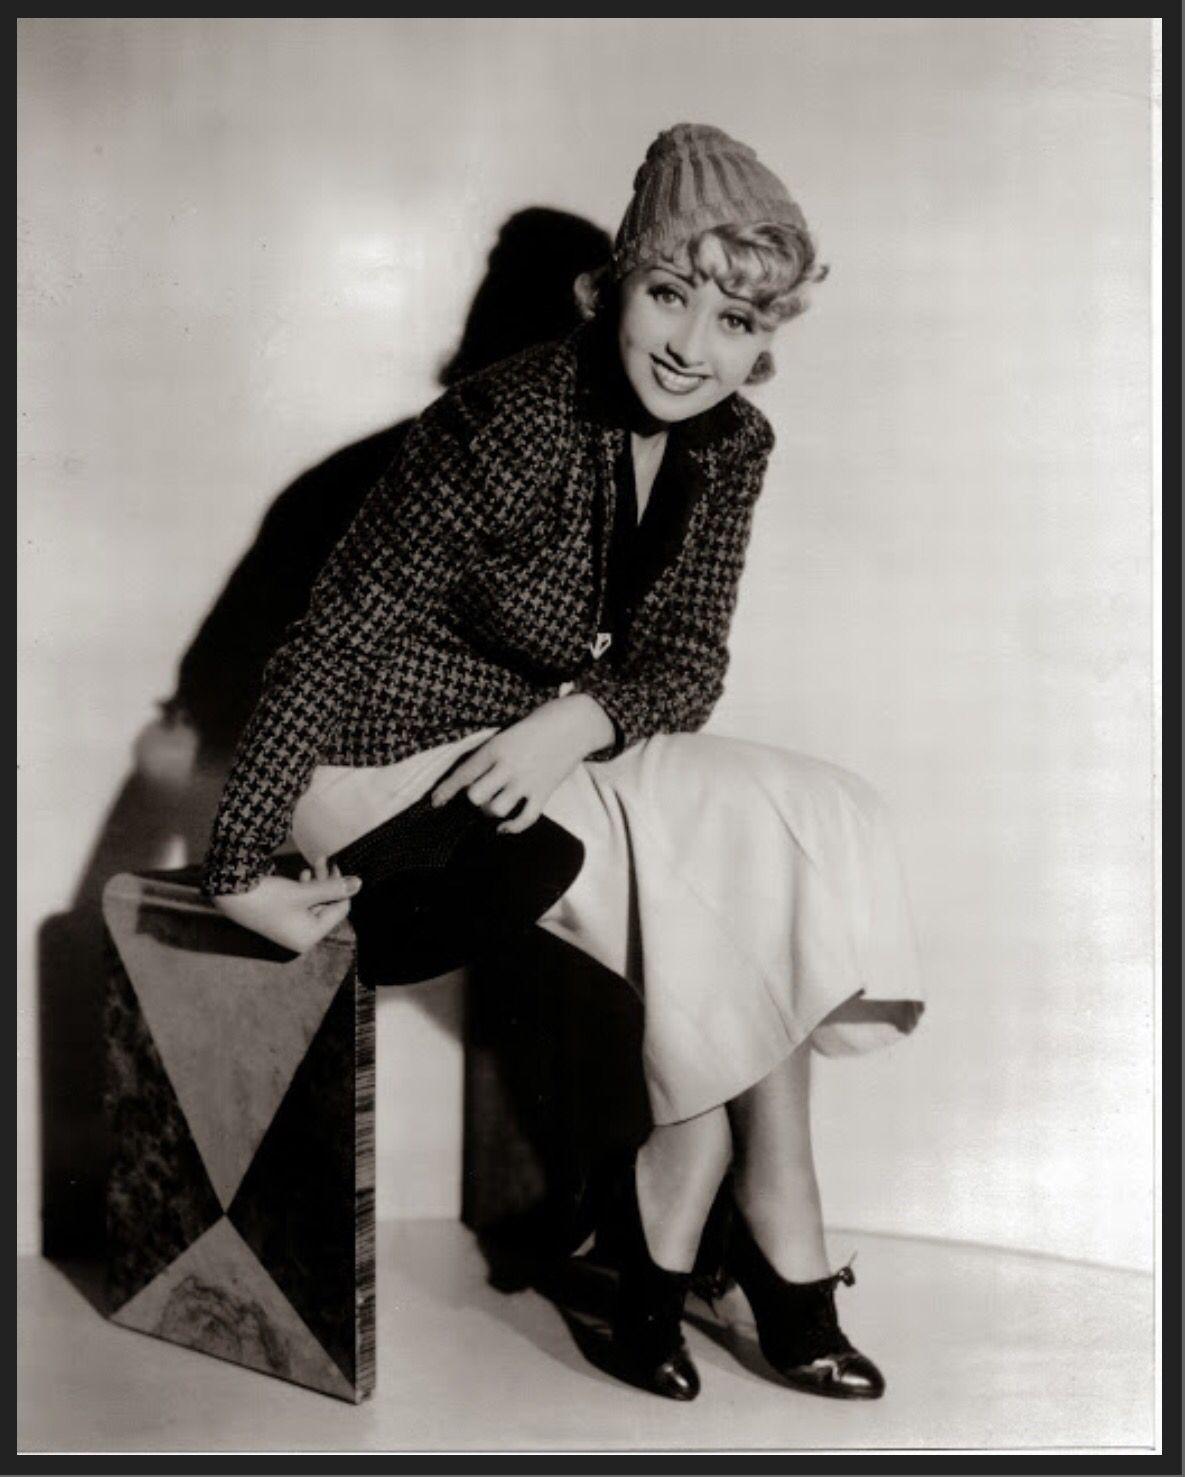 Joan Blondell gets her hair done, 1932 | Vintage hair